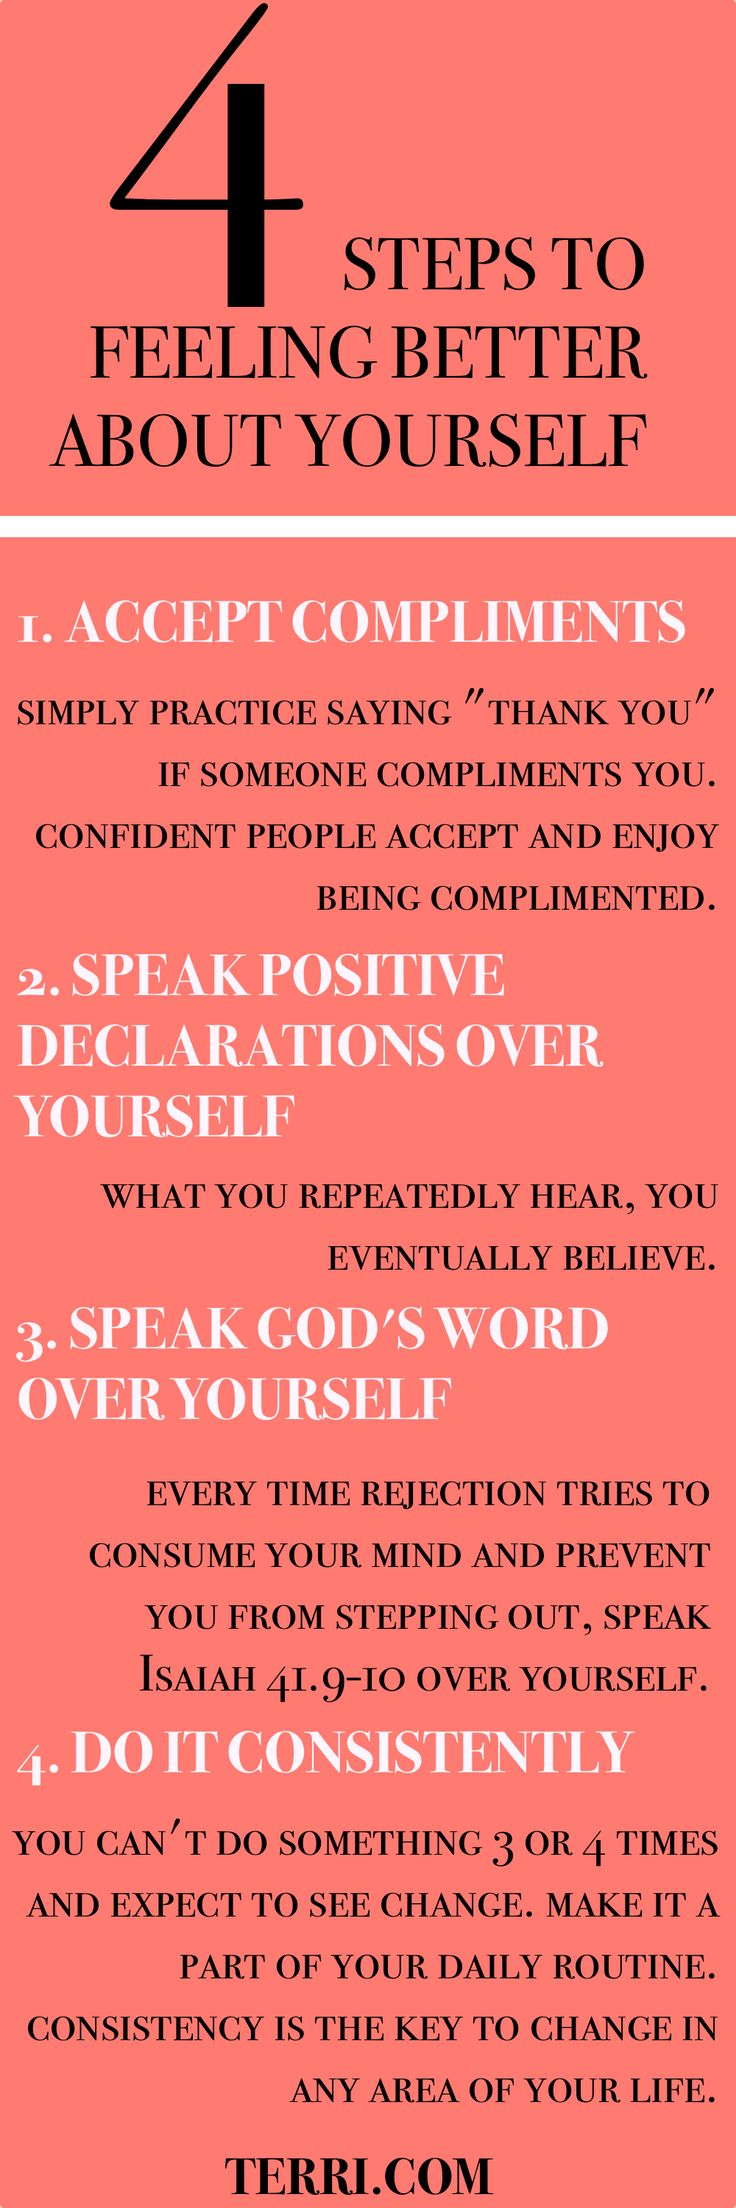 Best 25 Improve Yourself Ideas On Pinterest: Best 25+ Positive Self Talk Ideas On Pinterest